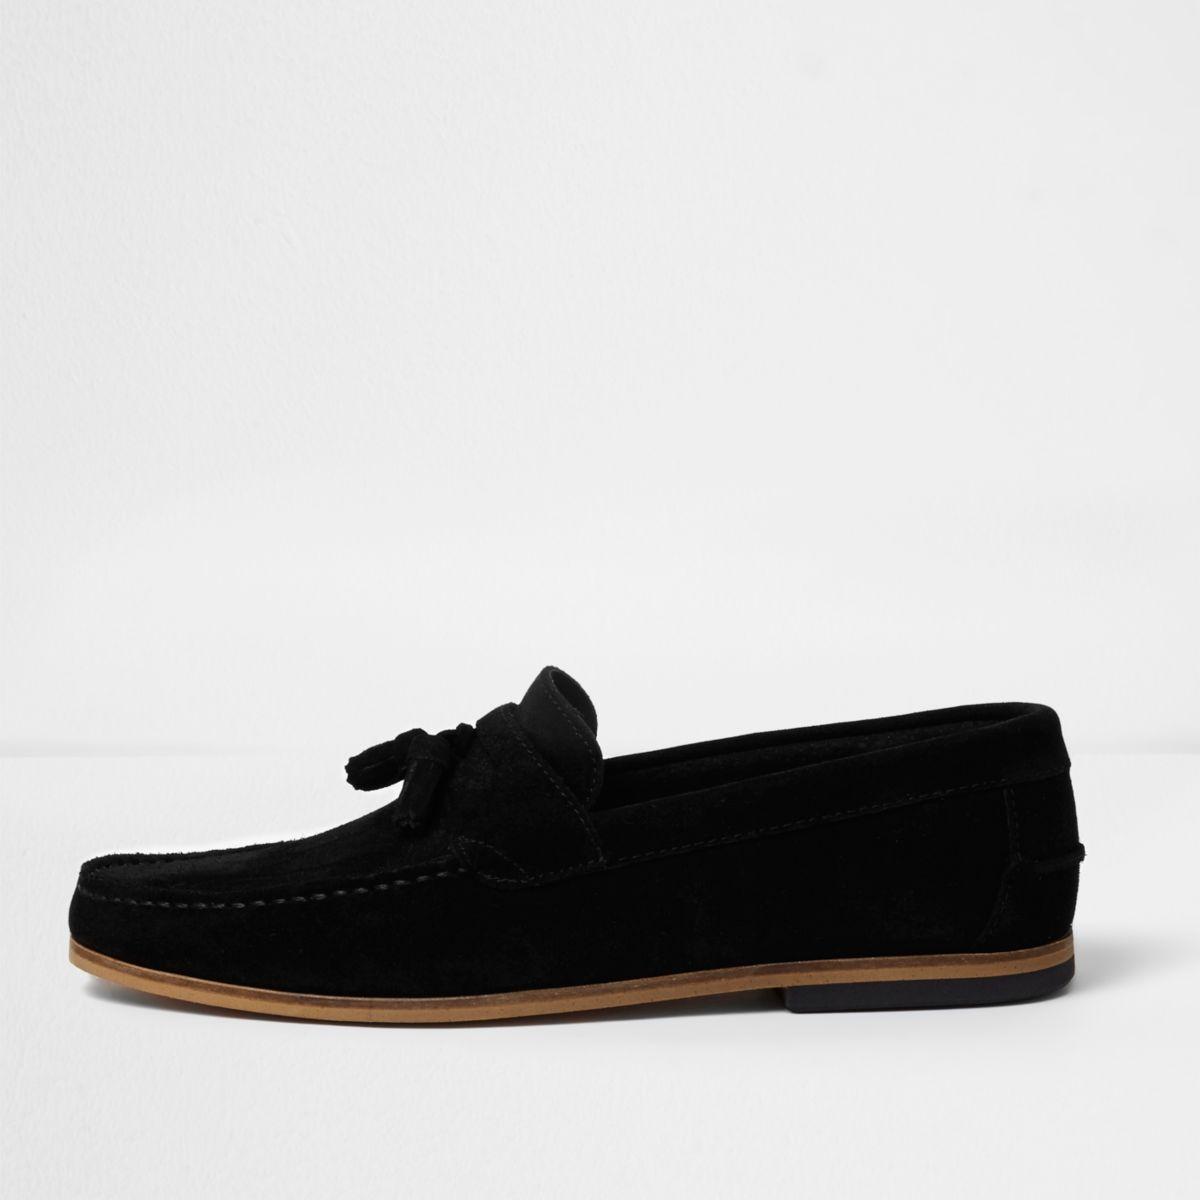 Black suede wide fit tassel loafers